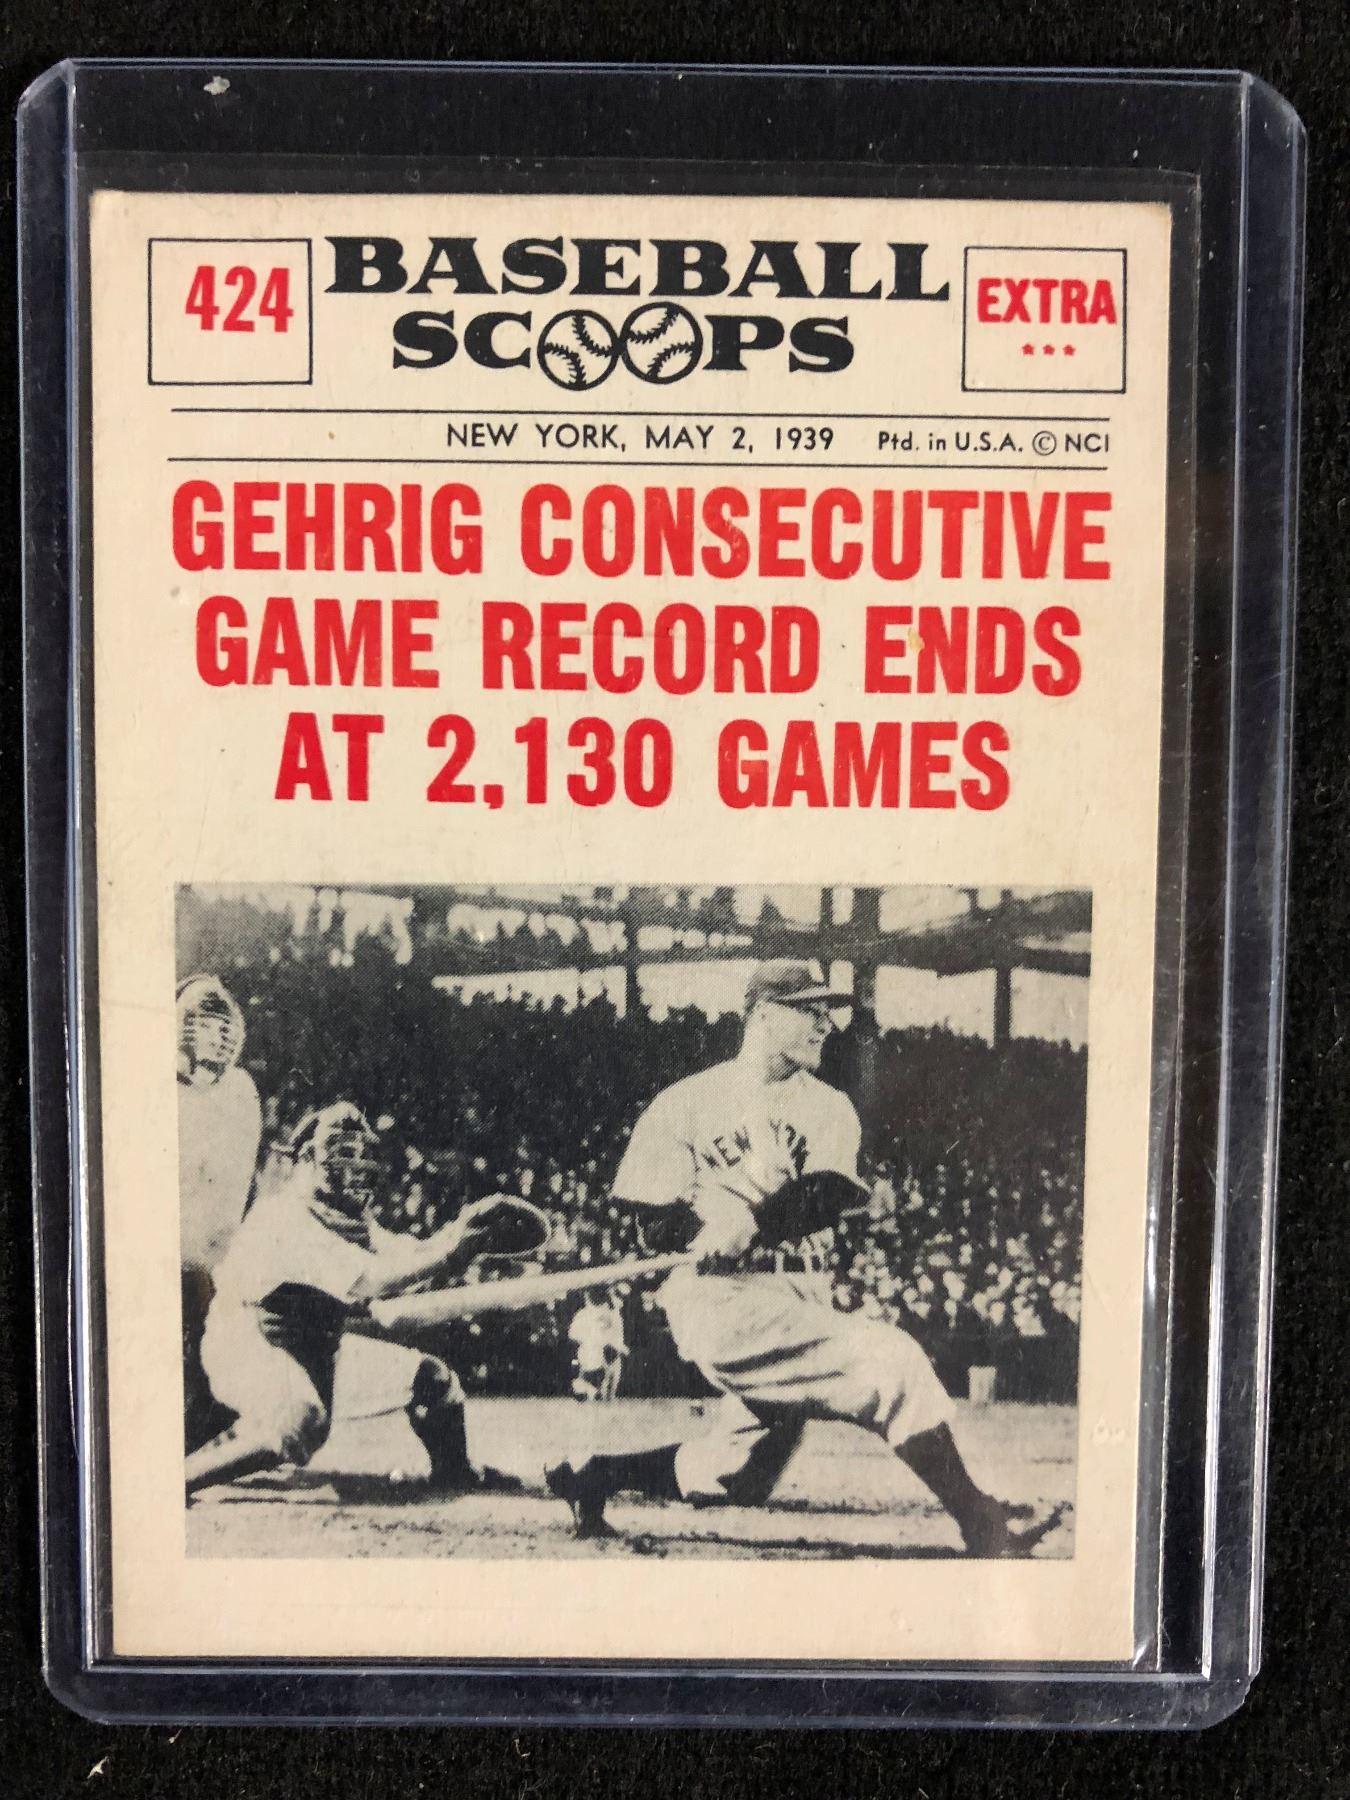 1961 Nu Card Scoops 424 Lou Gehrig Baseball Card